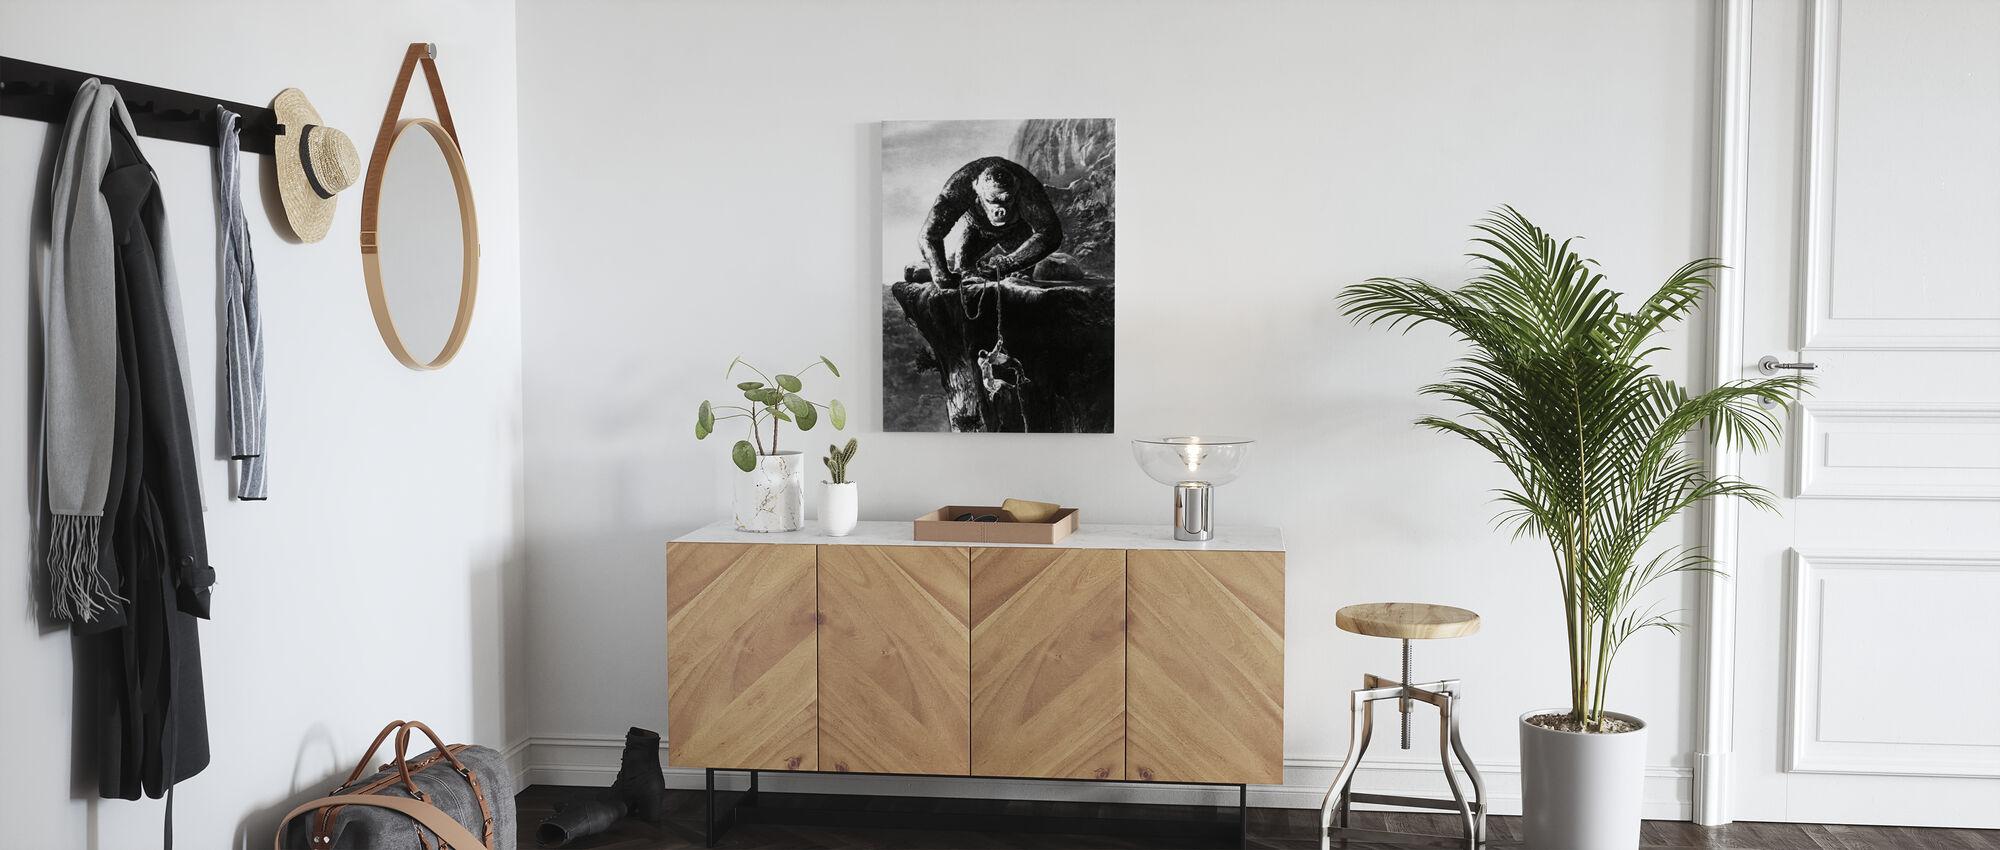 King Kong - Fay Wray - Impression sur toile - Entrée